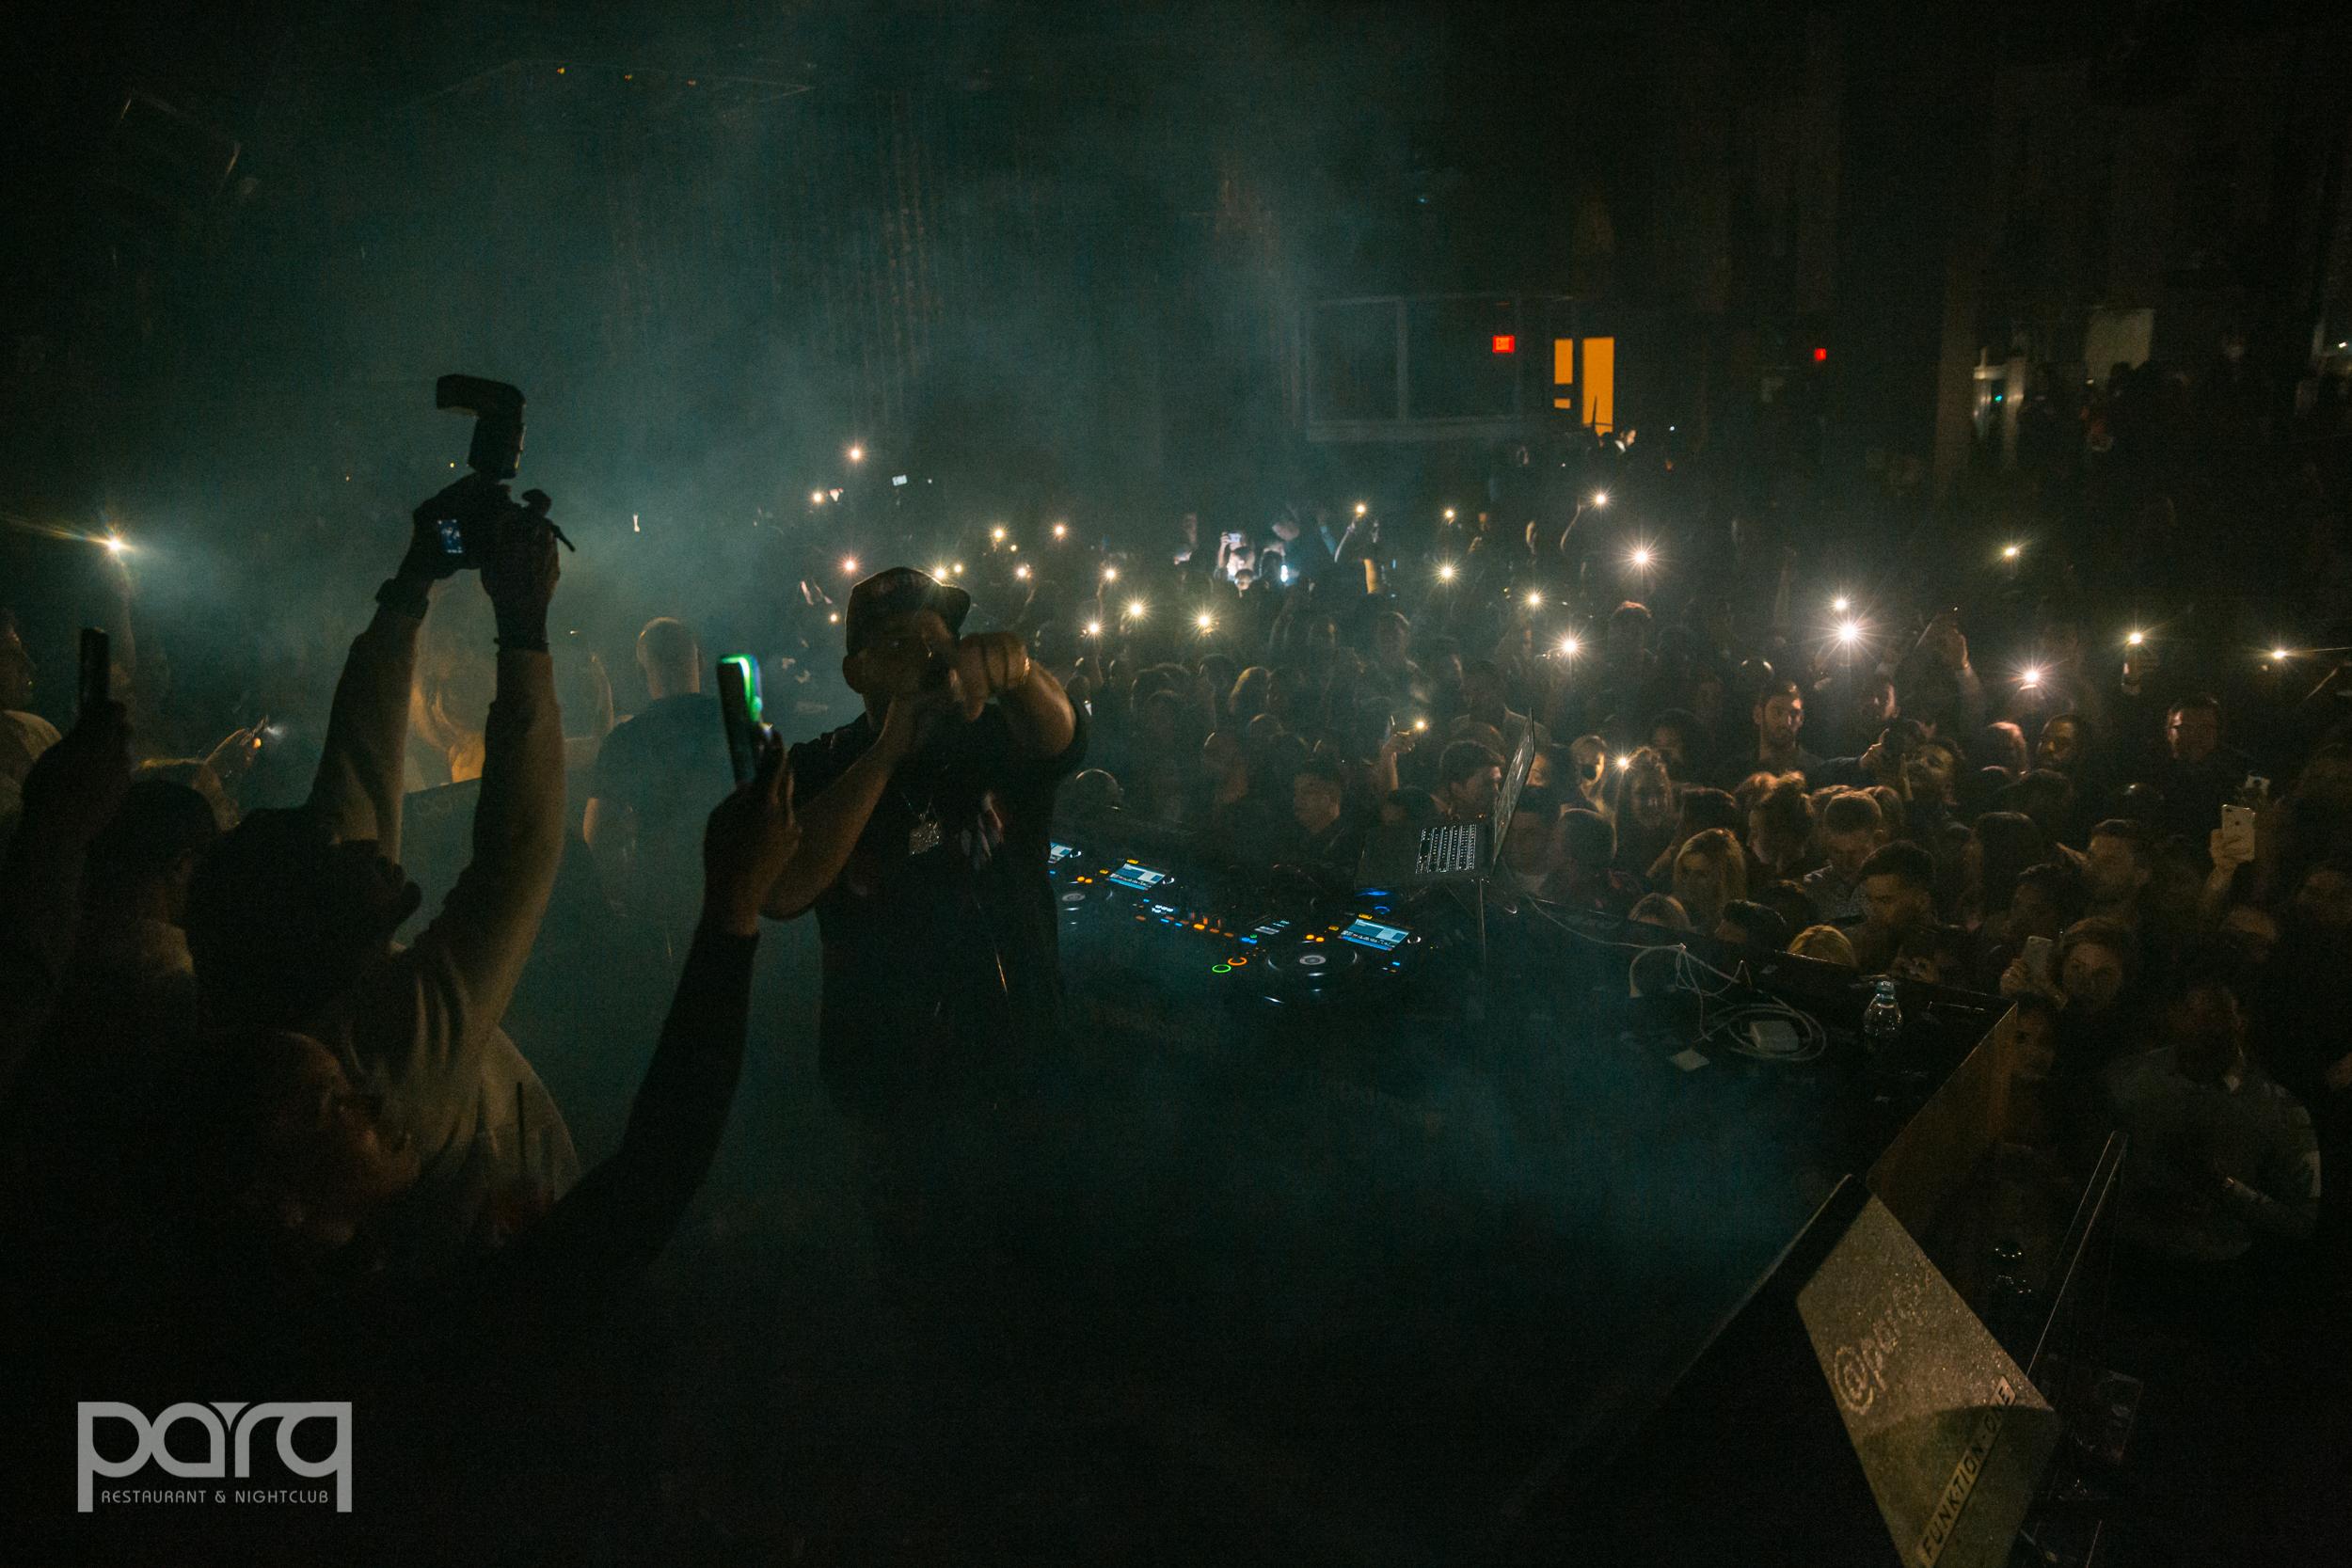 02.18.18 Parq - DJ Drama-27.jpg